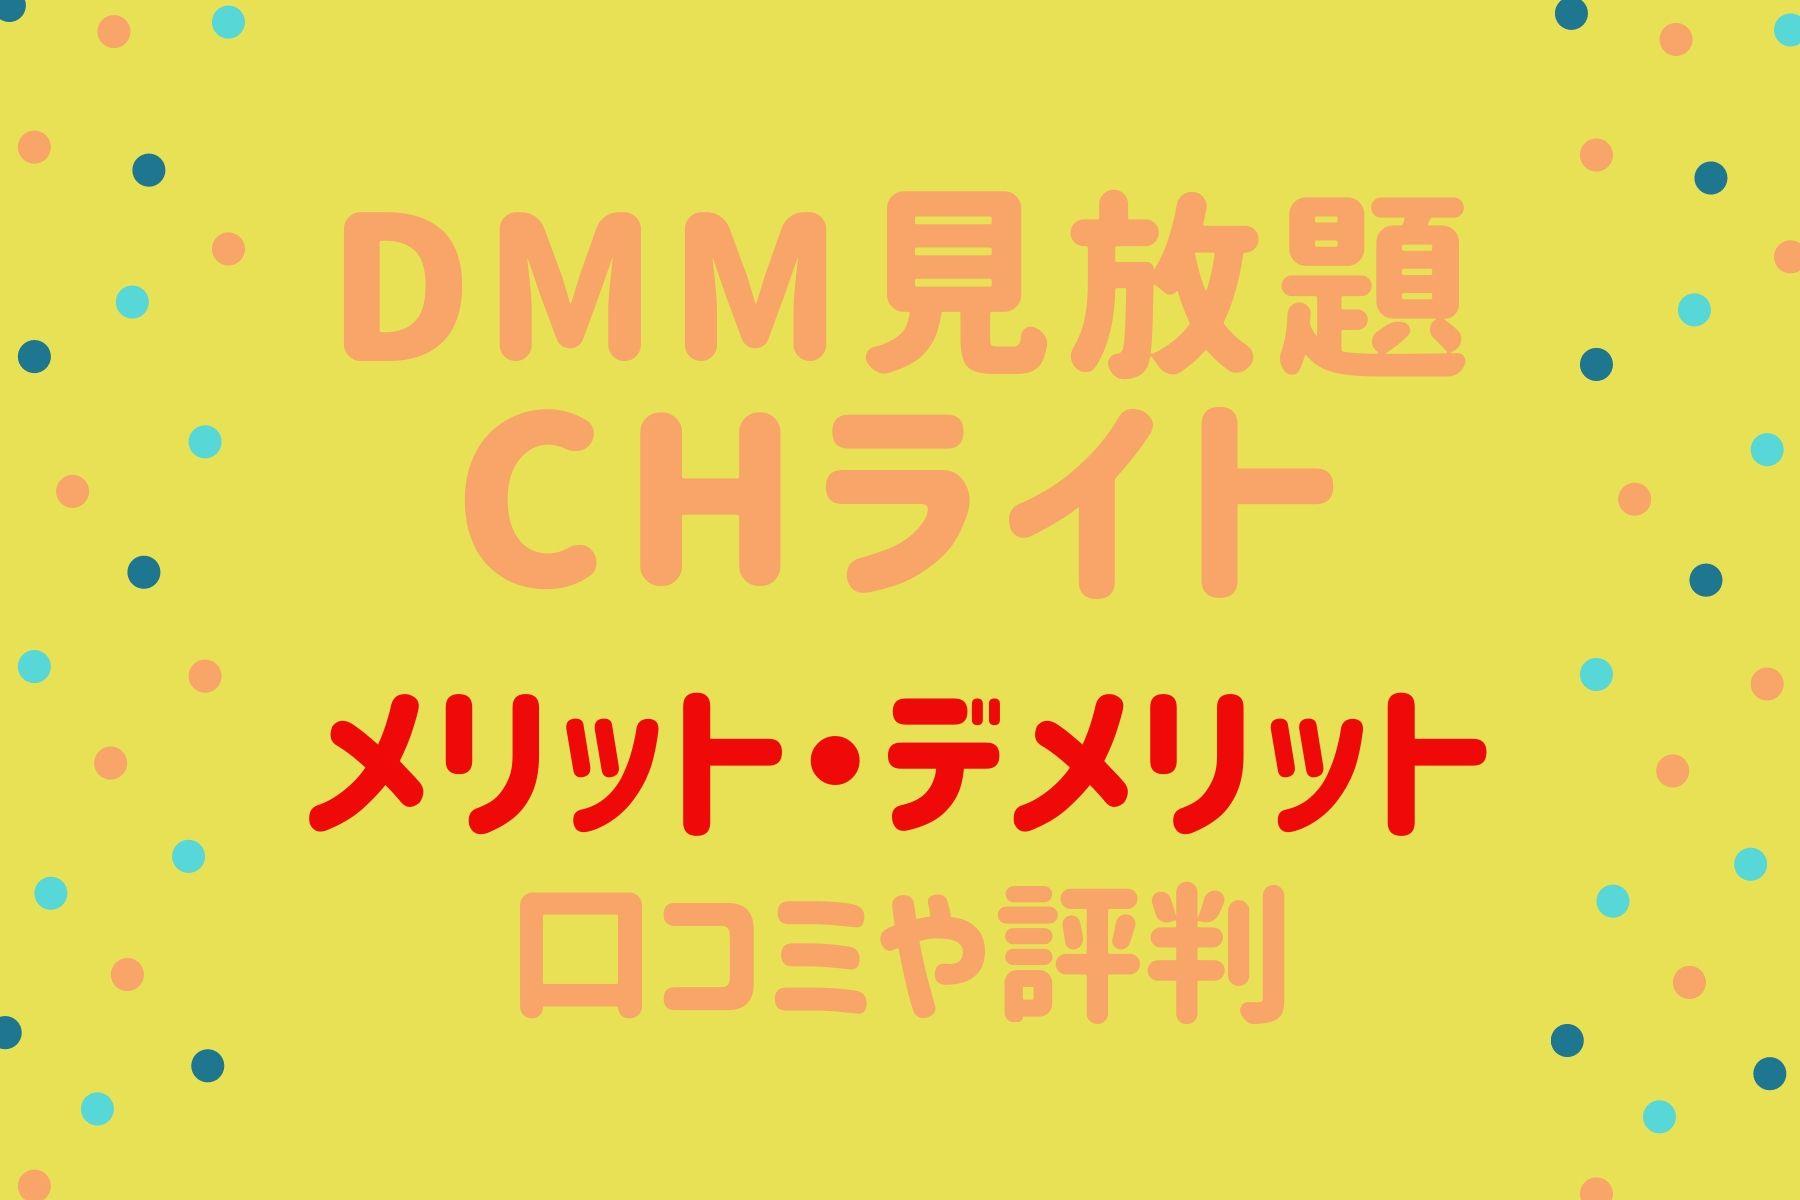 DMMm見放題chライトの6つのメリット・3つのデメリット|評判や口コミ